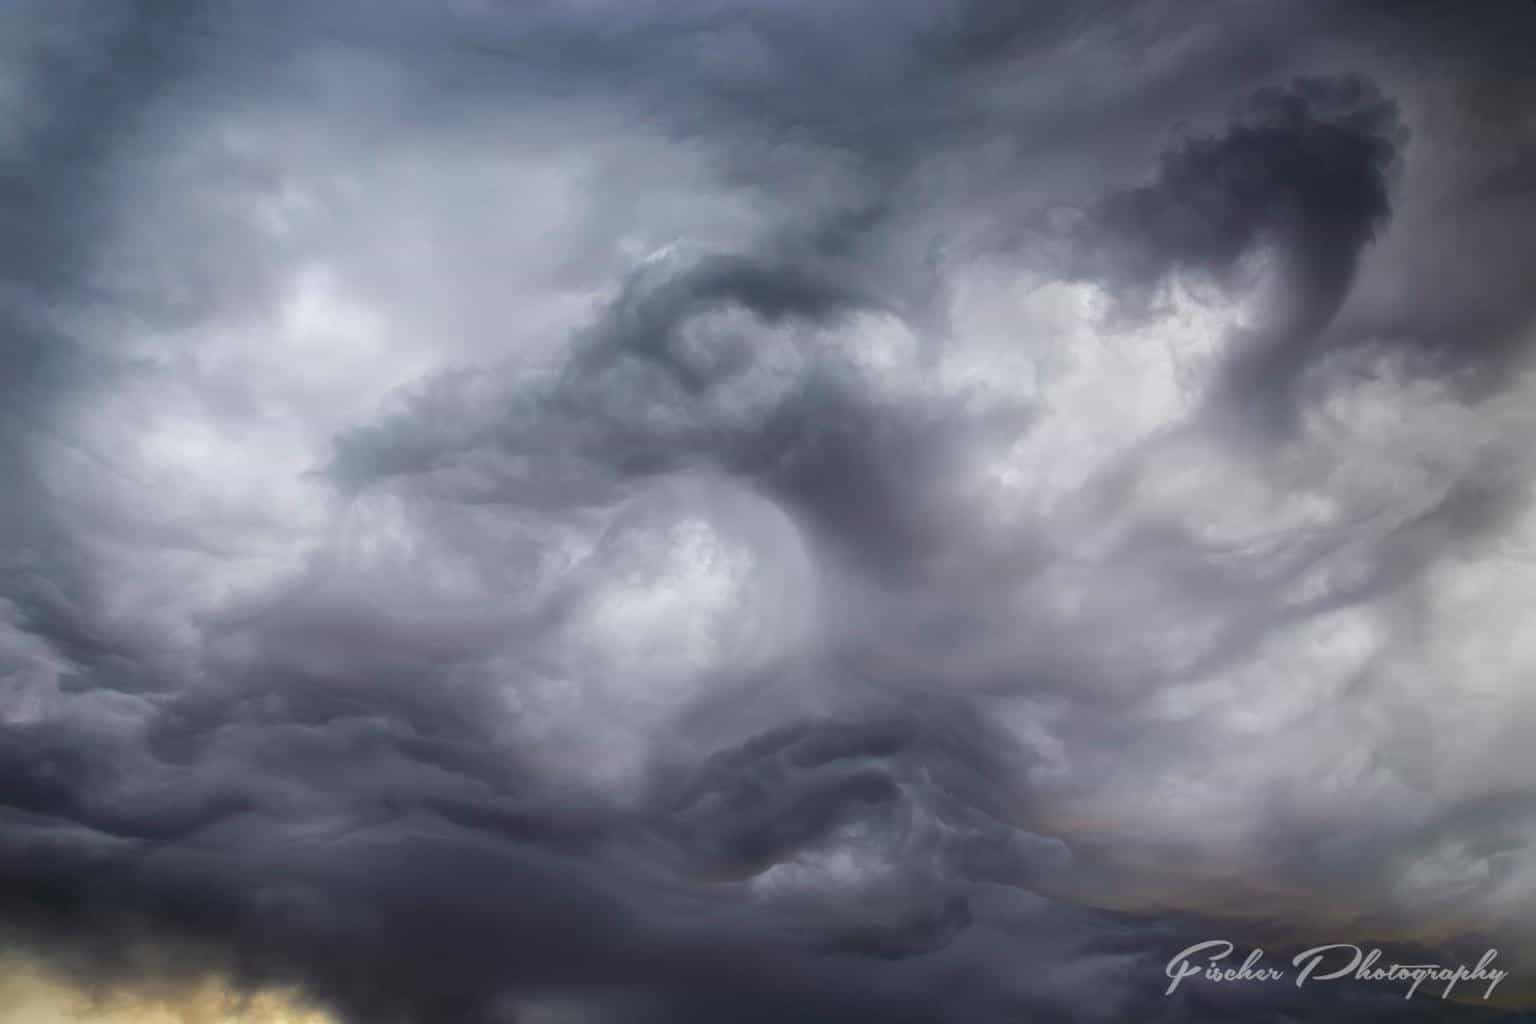 """Dragon Skies"" - formations in undulatus asperatus clouds over the Plano Balloon Festival last year."